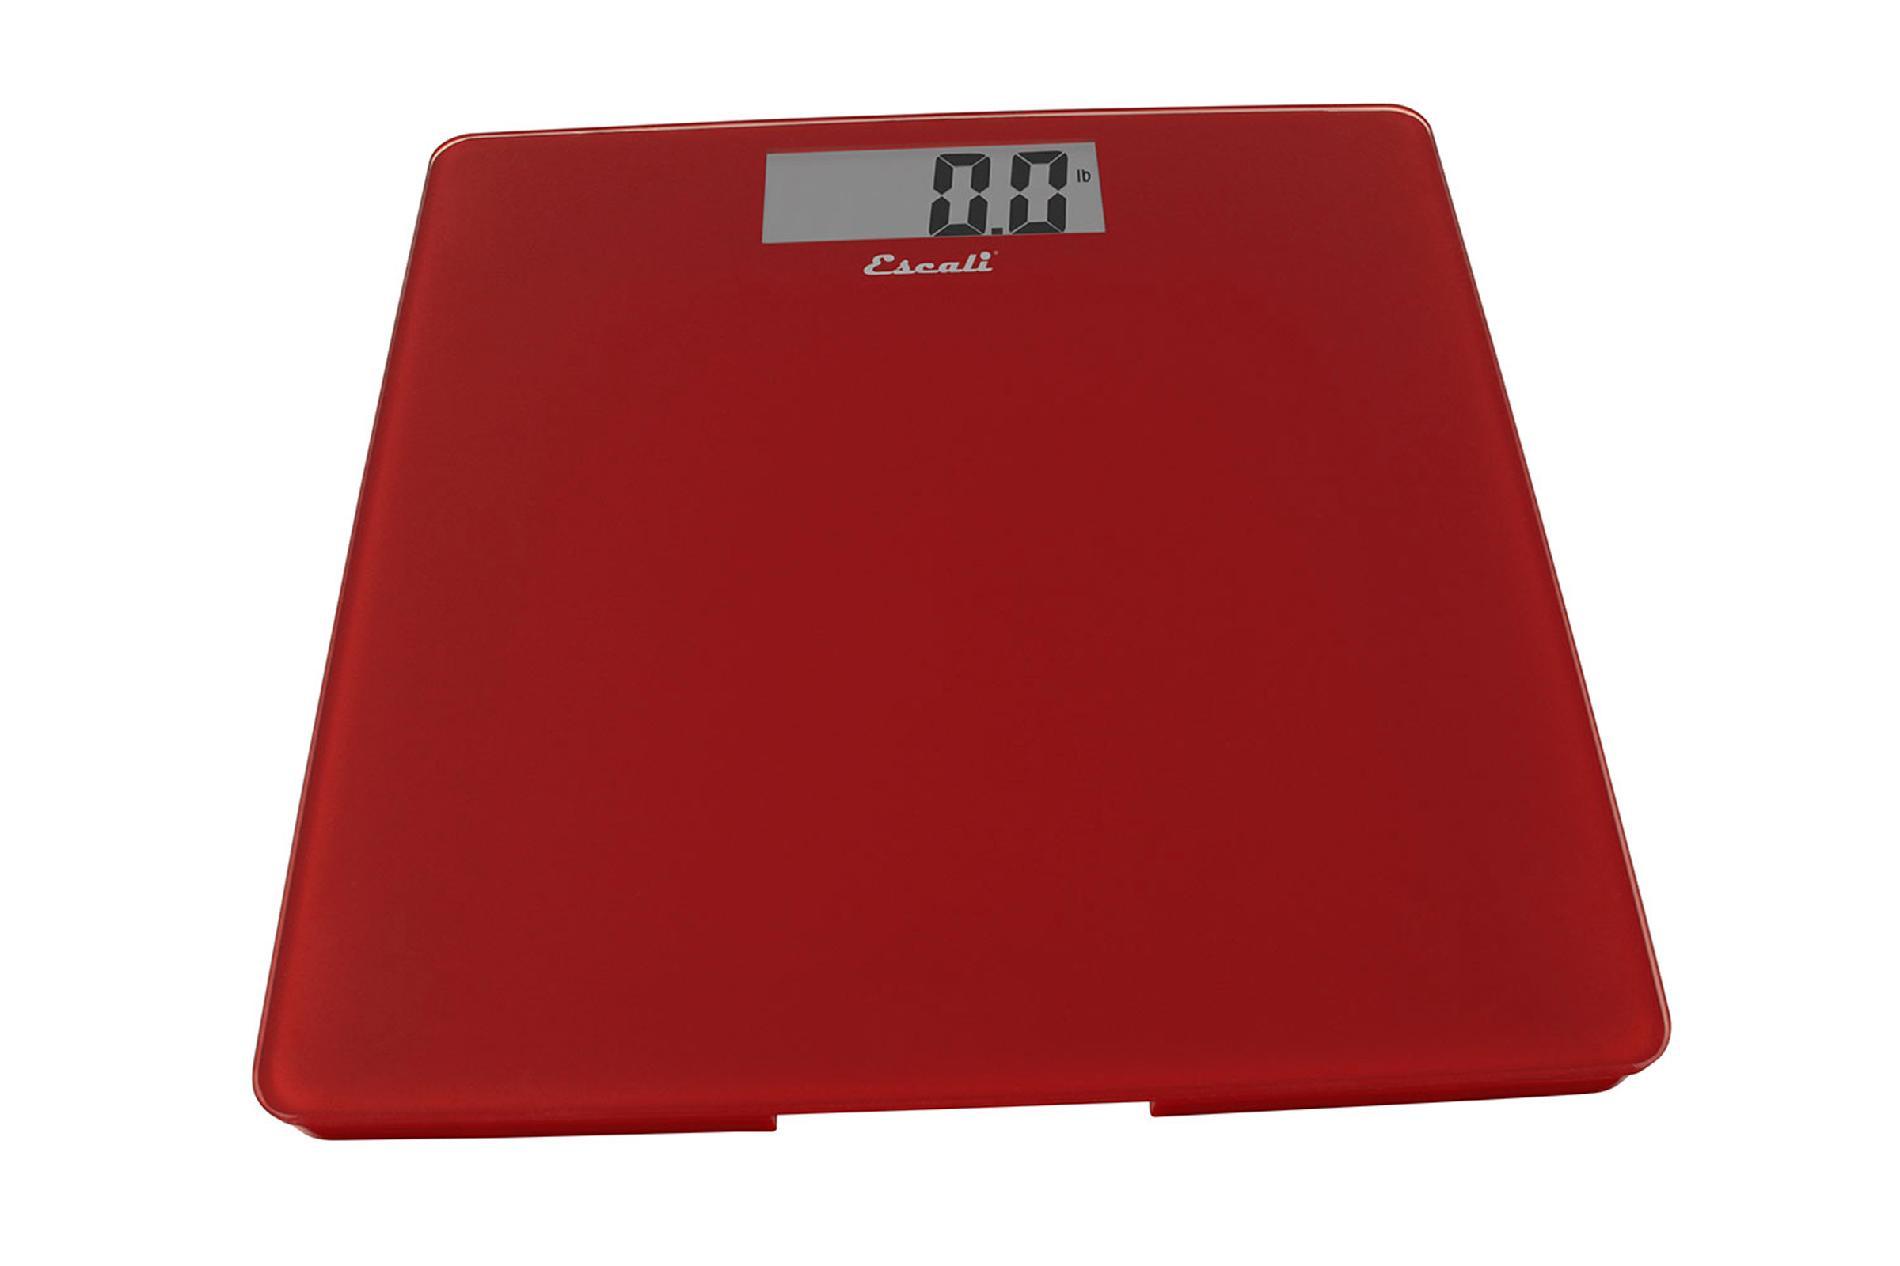 Glass Platform Bathroom Scale  Rio Red  440 Lb / 200 Kg